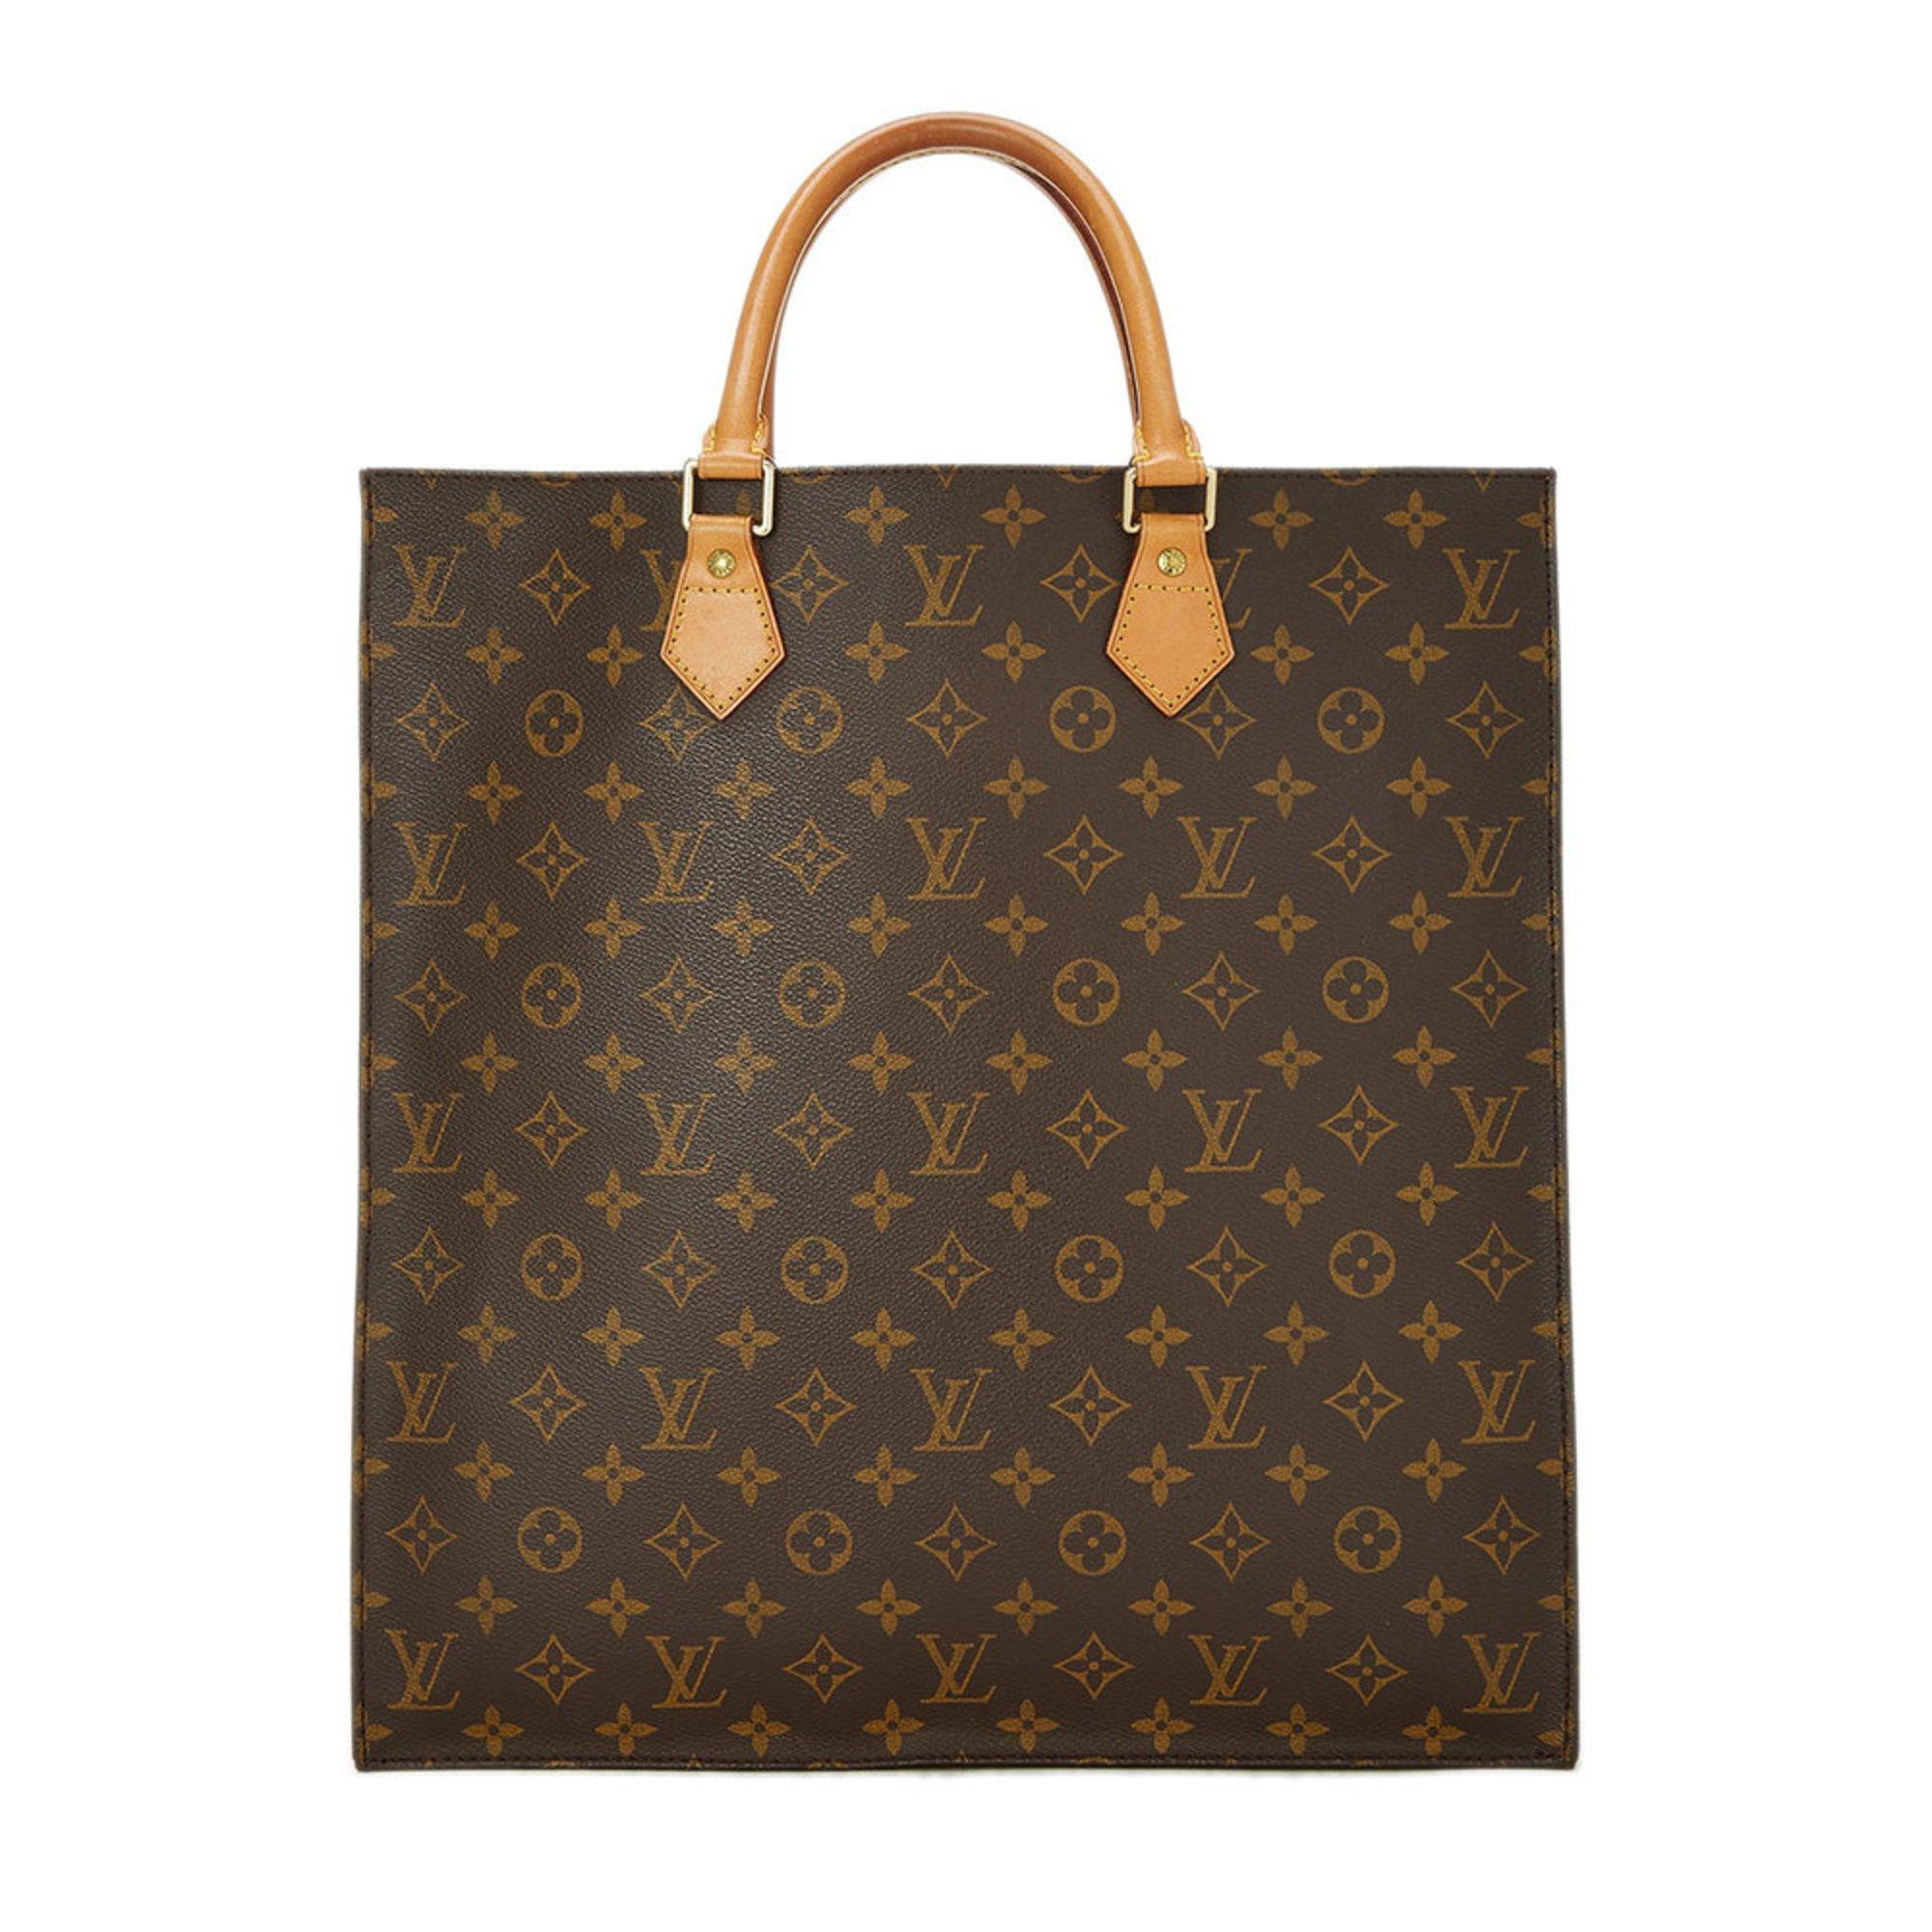 380adbf090fe Louis Vuitton Monogram Sac Plat